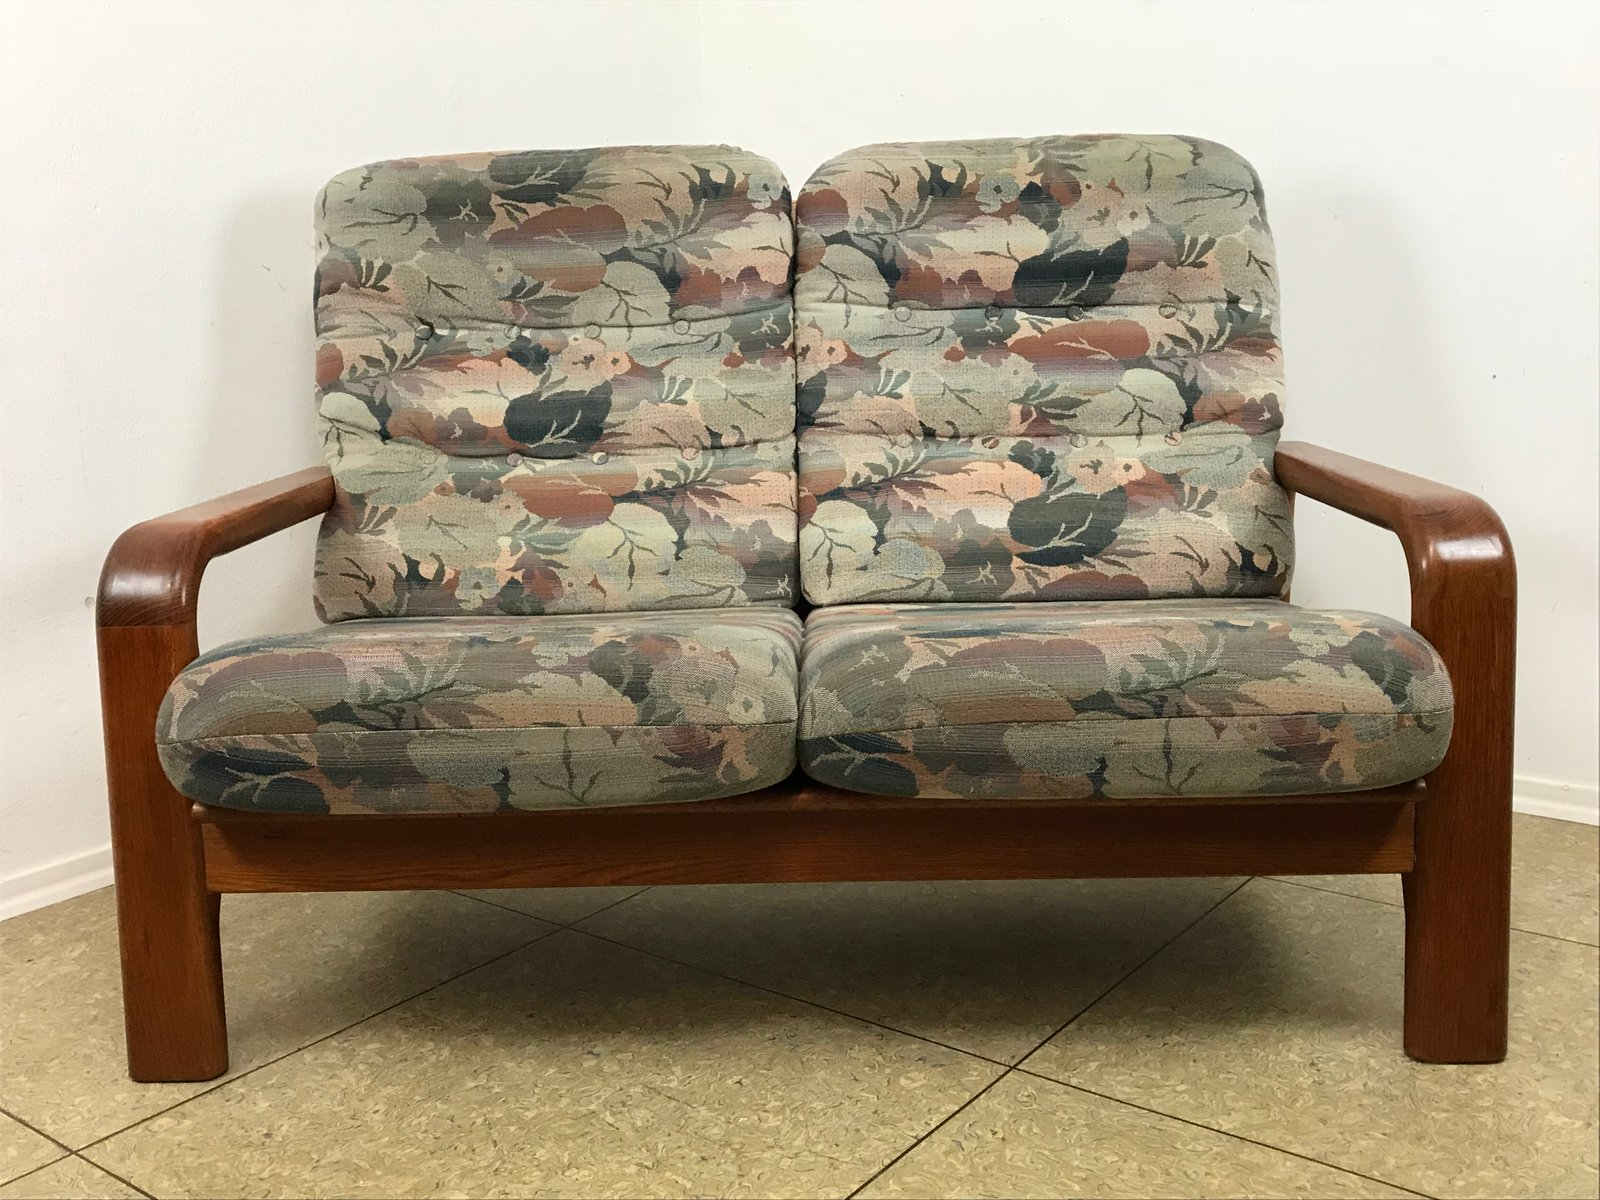 Danish Teak 2-Seater Sofa, 1970s for sale at Pamono